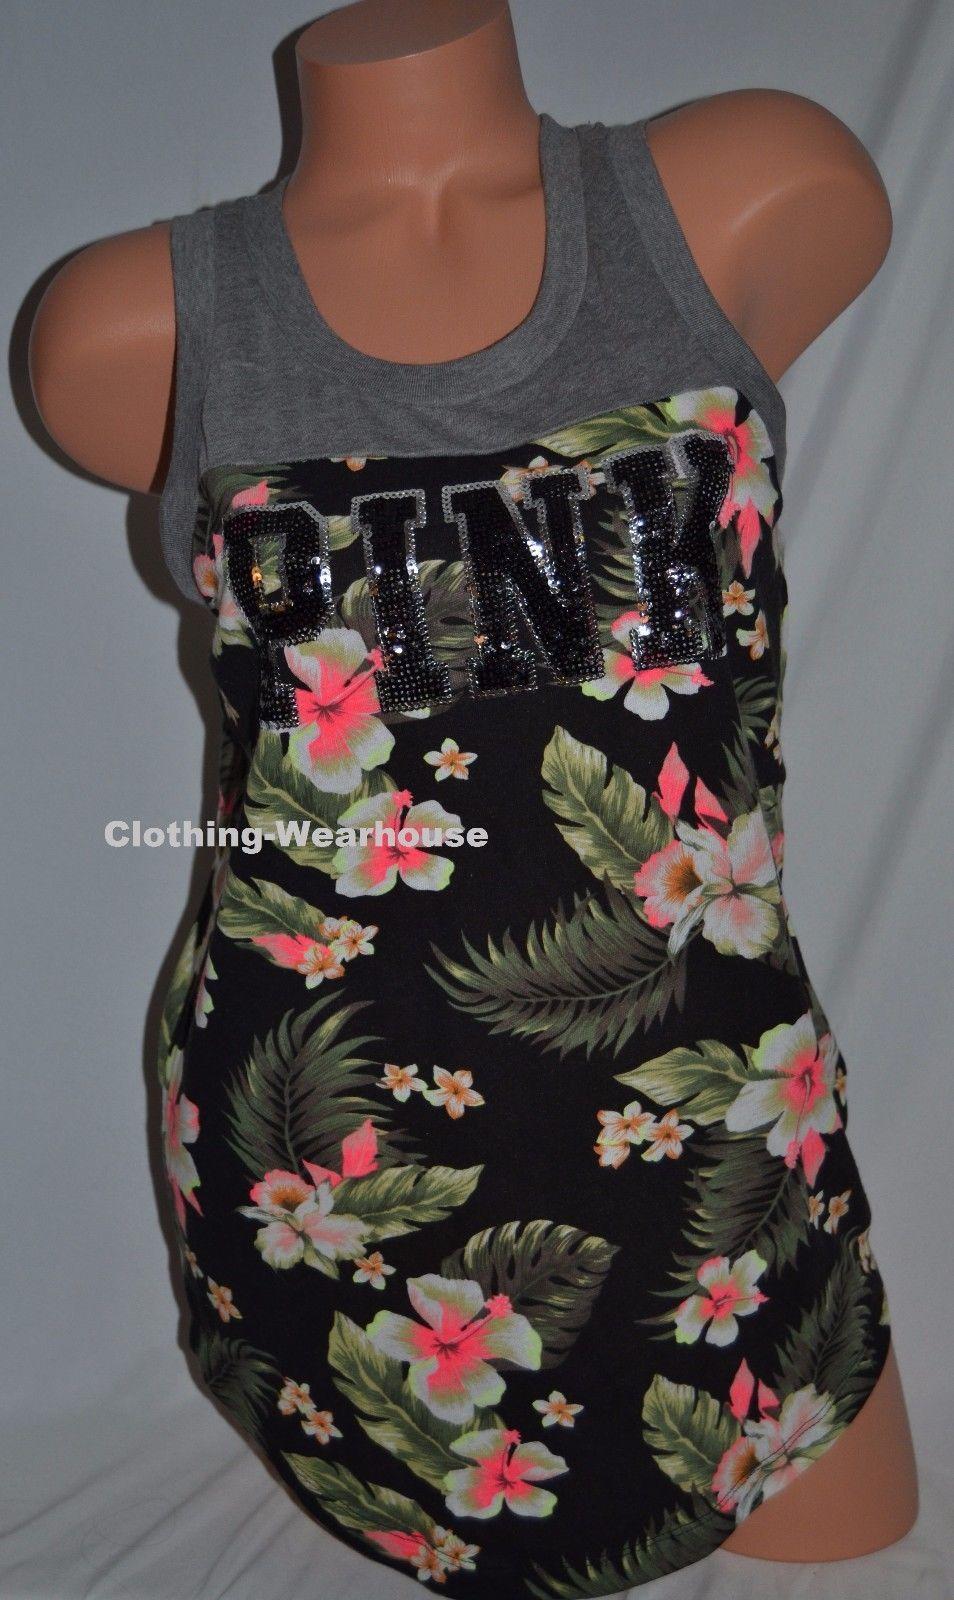 076ccd93c8ed1 Victoria's Secret PINK Rib Neck Tank Top and 50 similar items